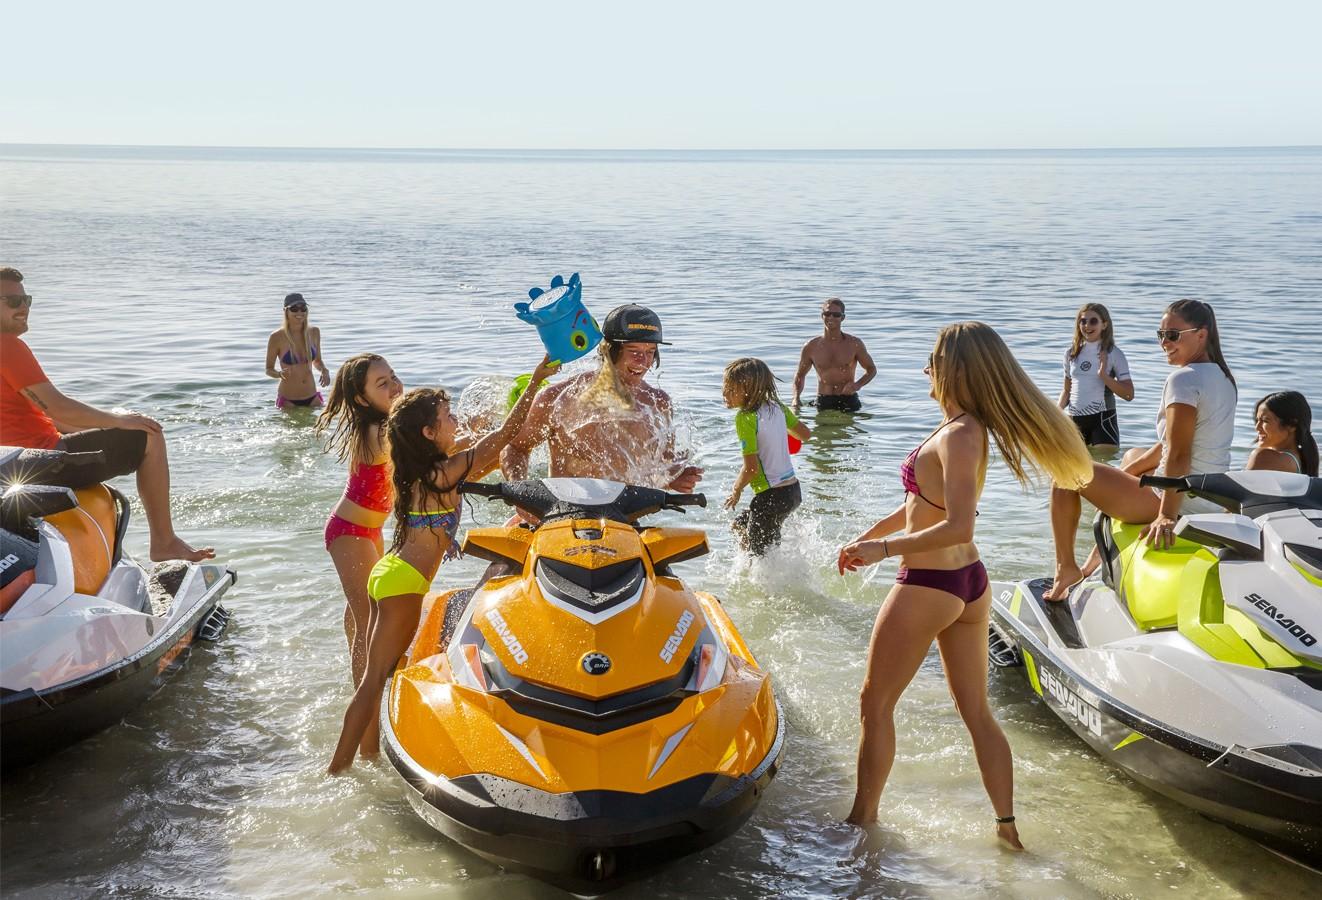 Kawasaki Stand Up Jet Ski For Sale In Michigan